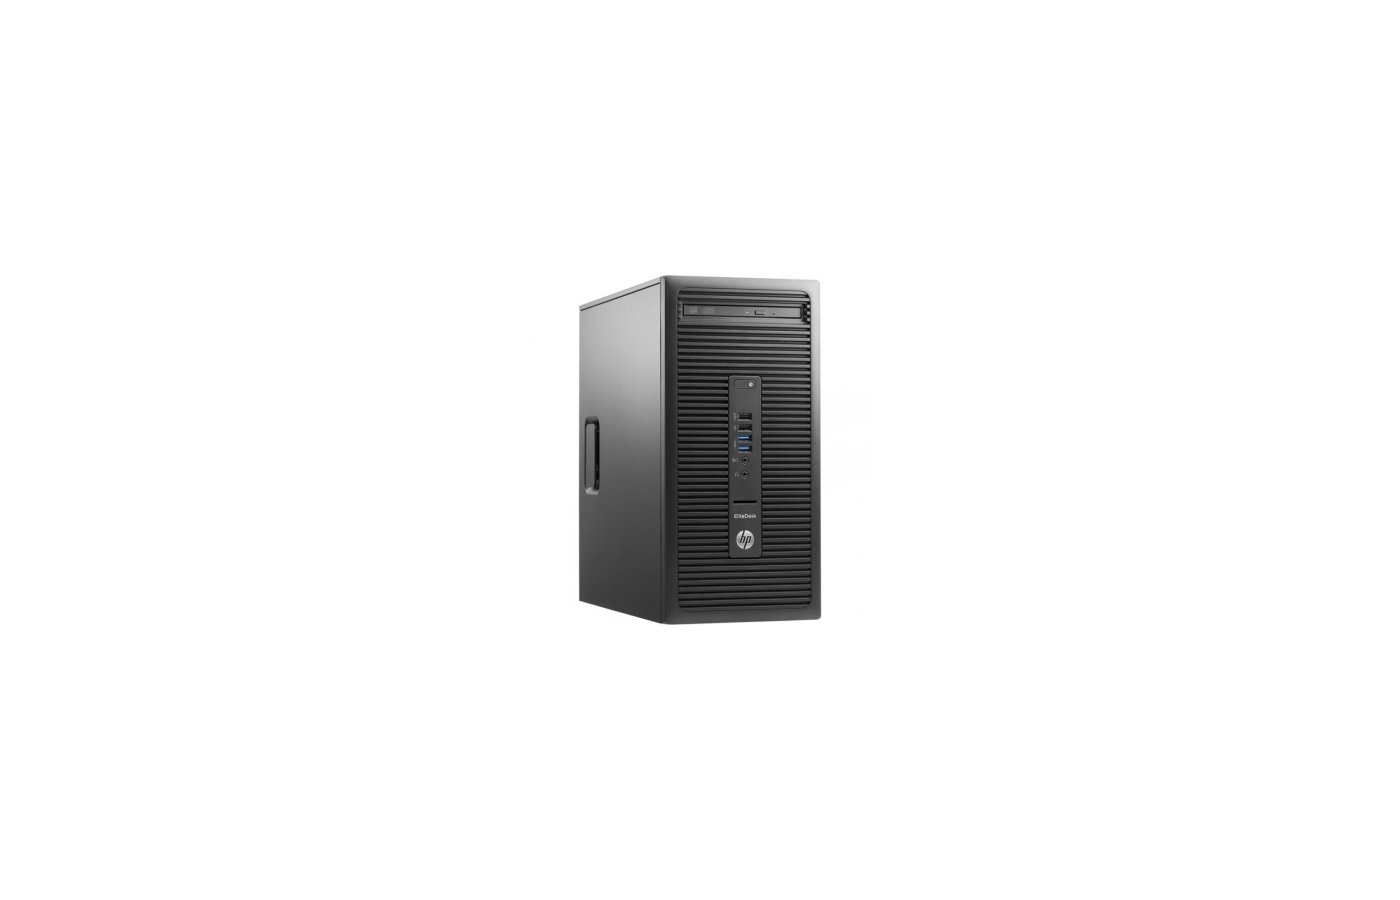 Системный блок HP EliteDesk 800 G2 /T4J48EA/